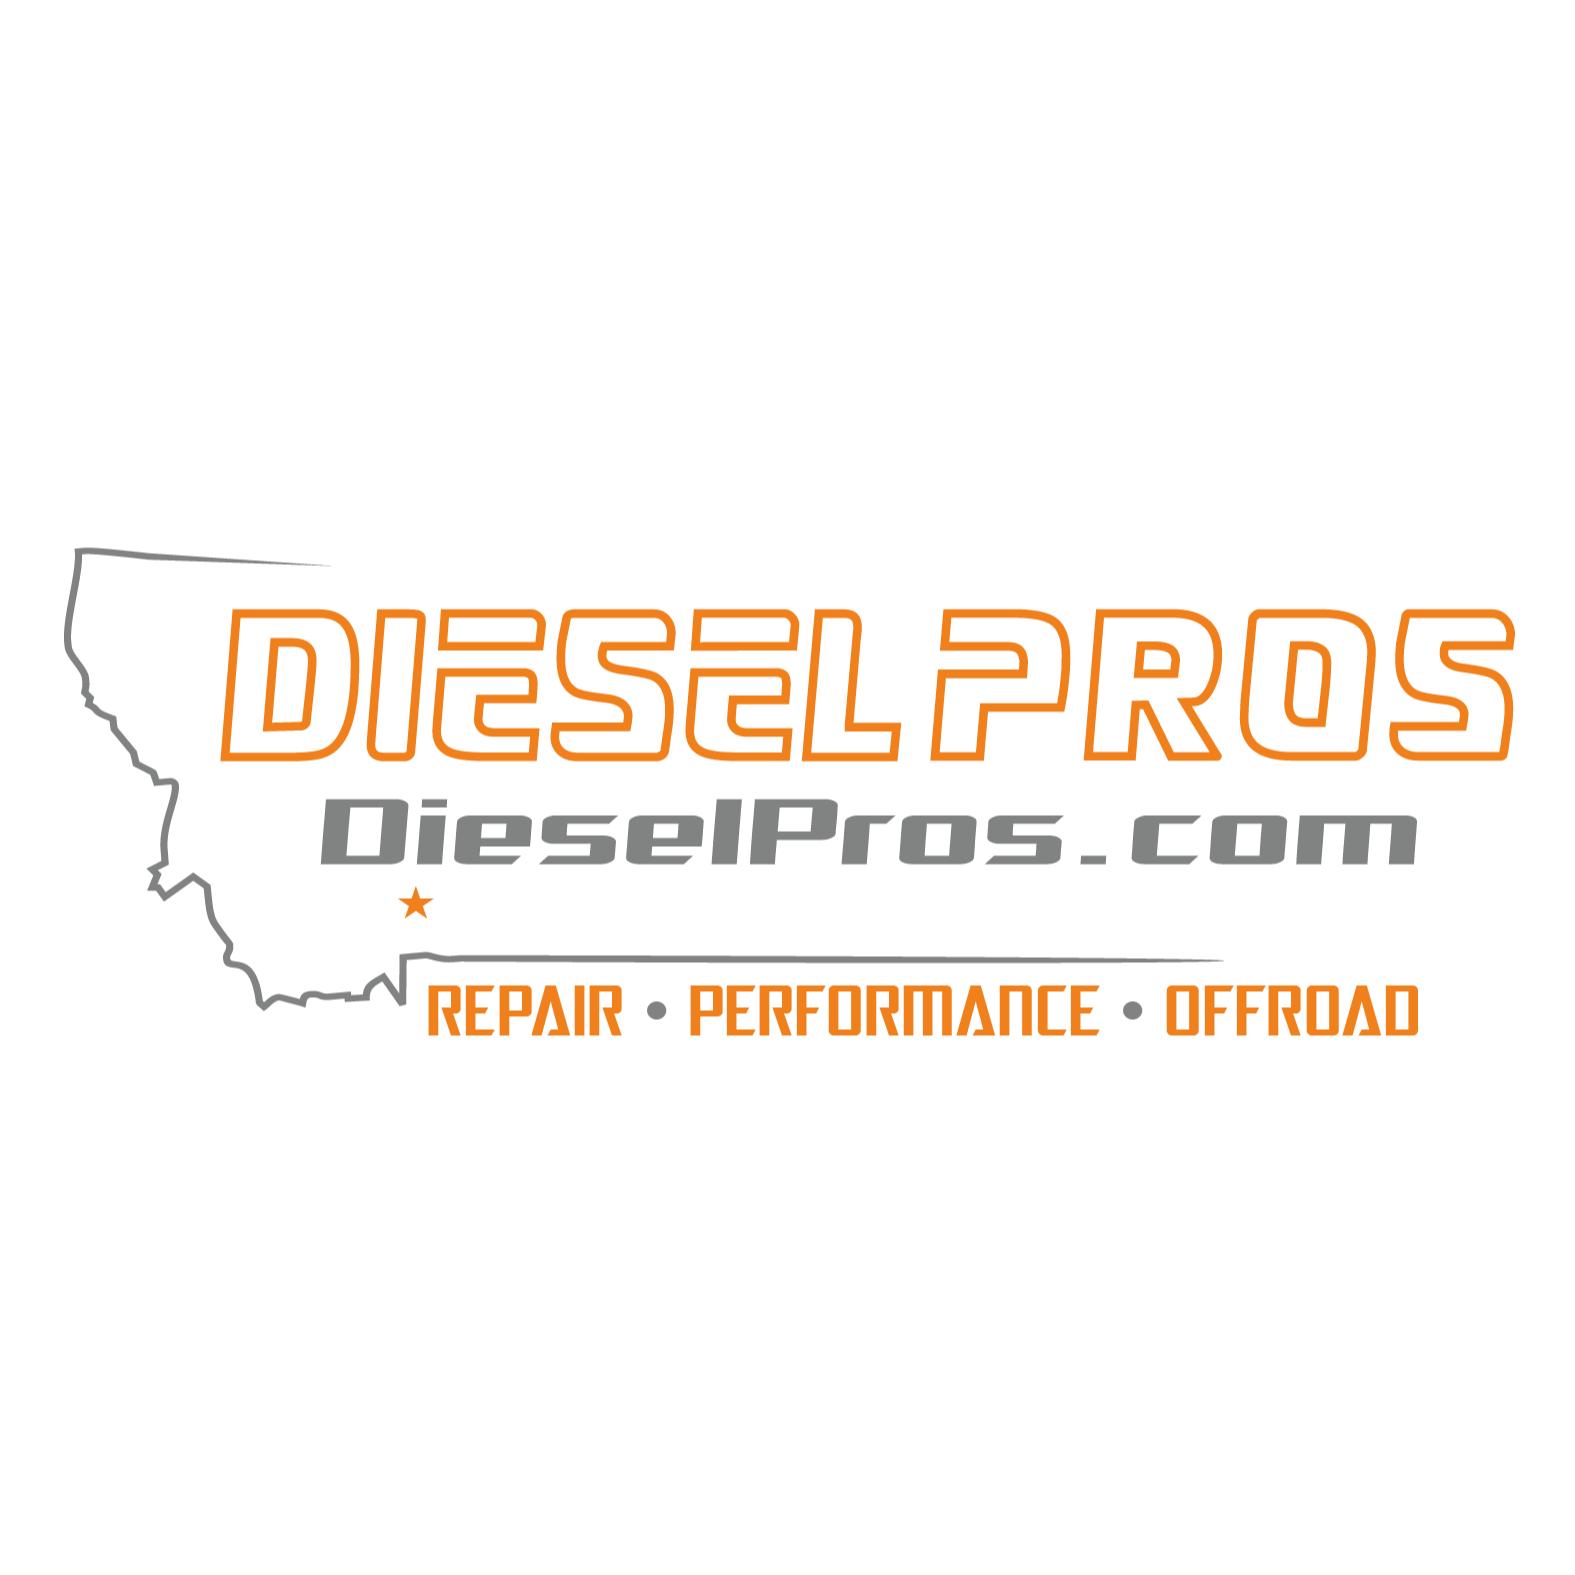 Diesel Pros Logo